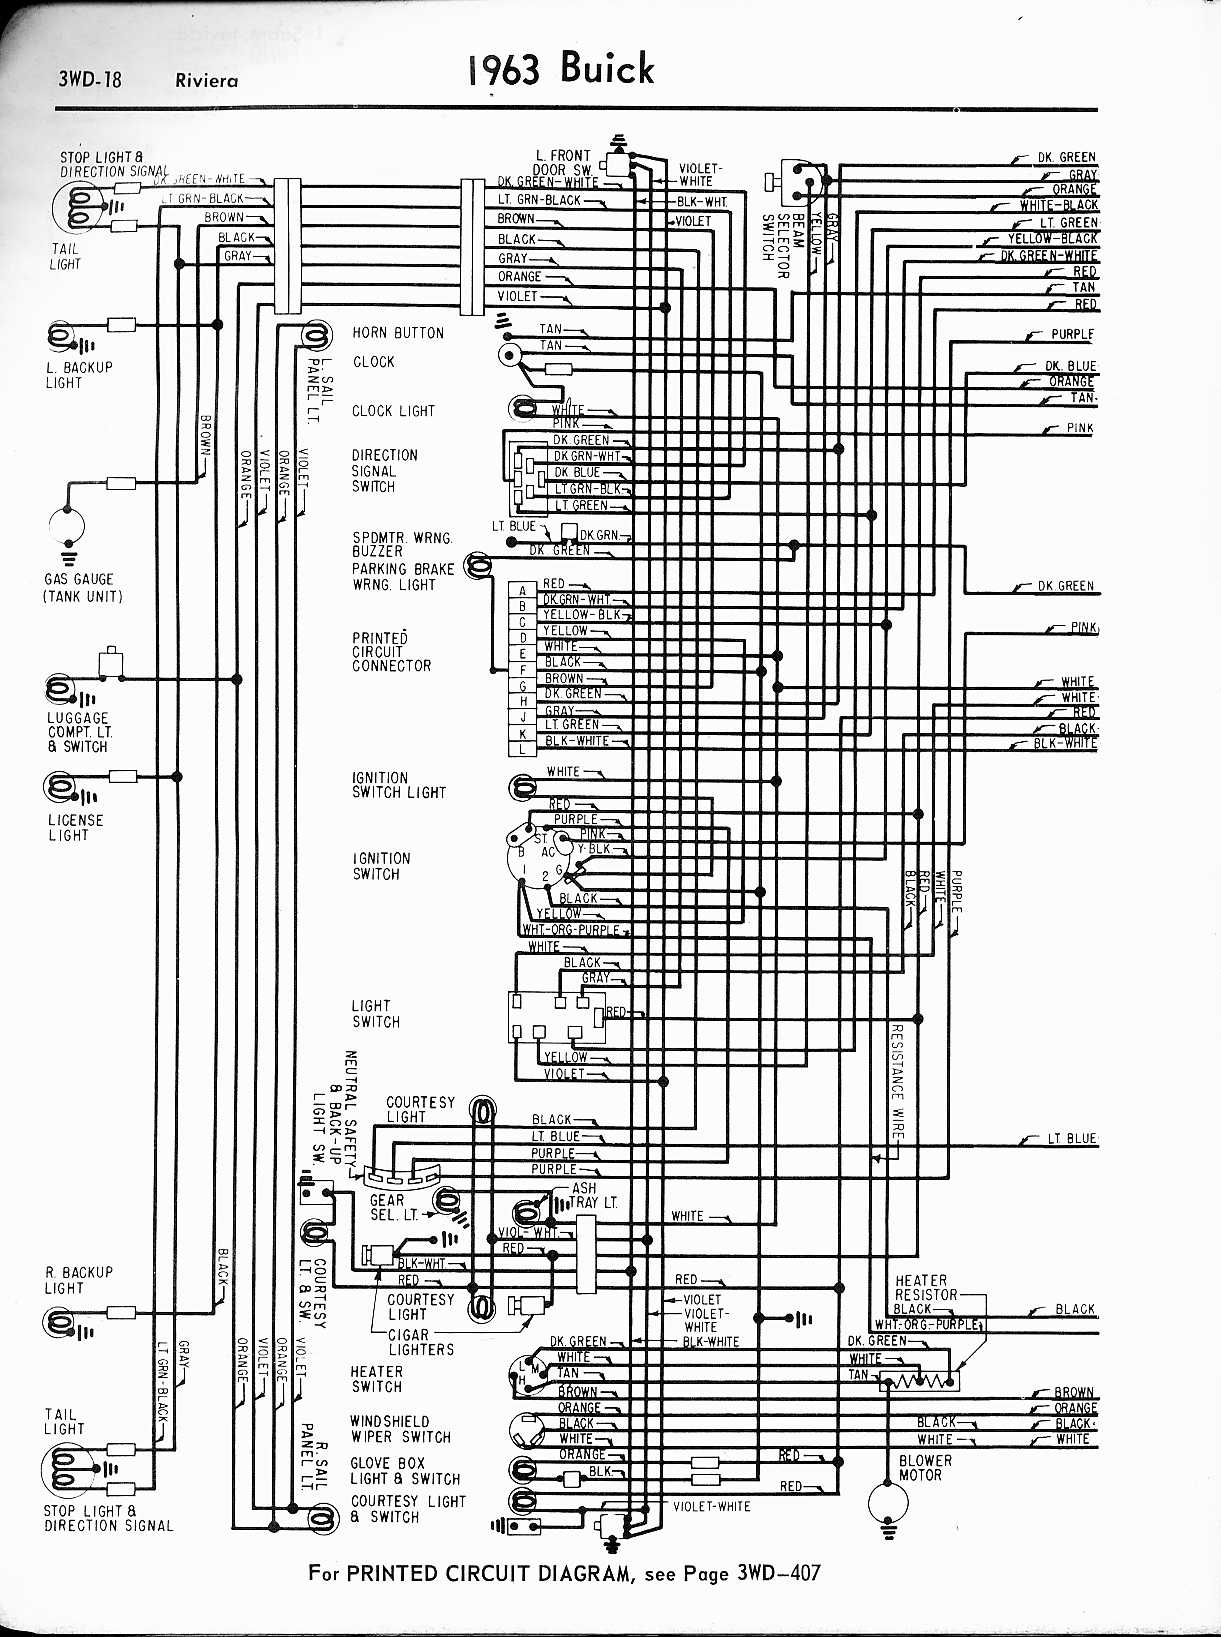 XR_0409 1968 Buick Skylark Wiring Diagram Download Diagram [ 1637 x 1221 Pixel ]